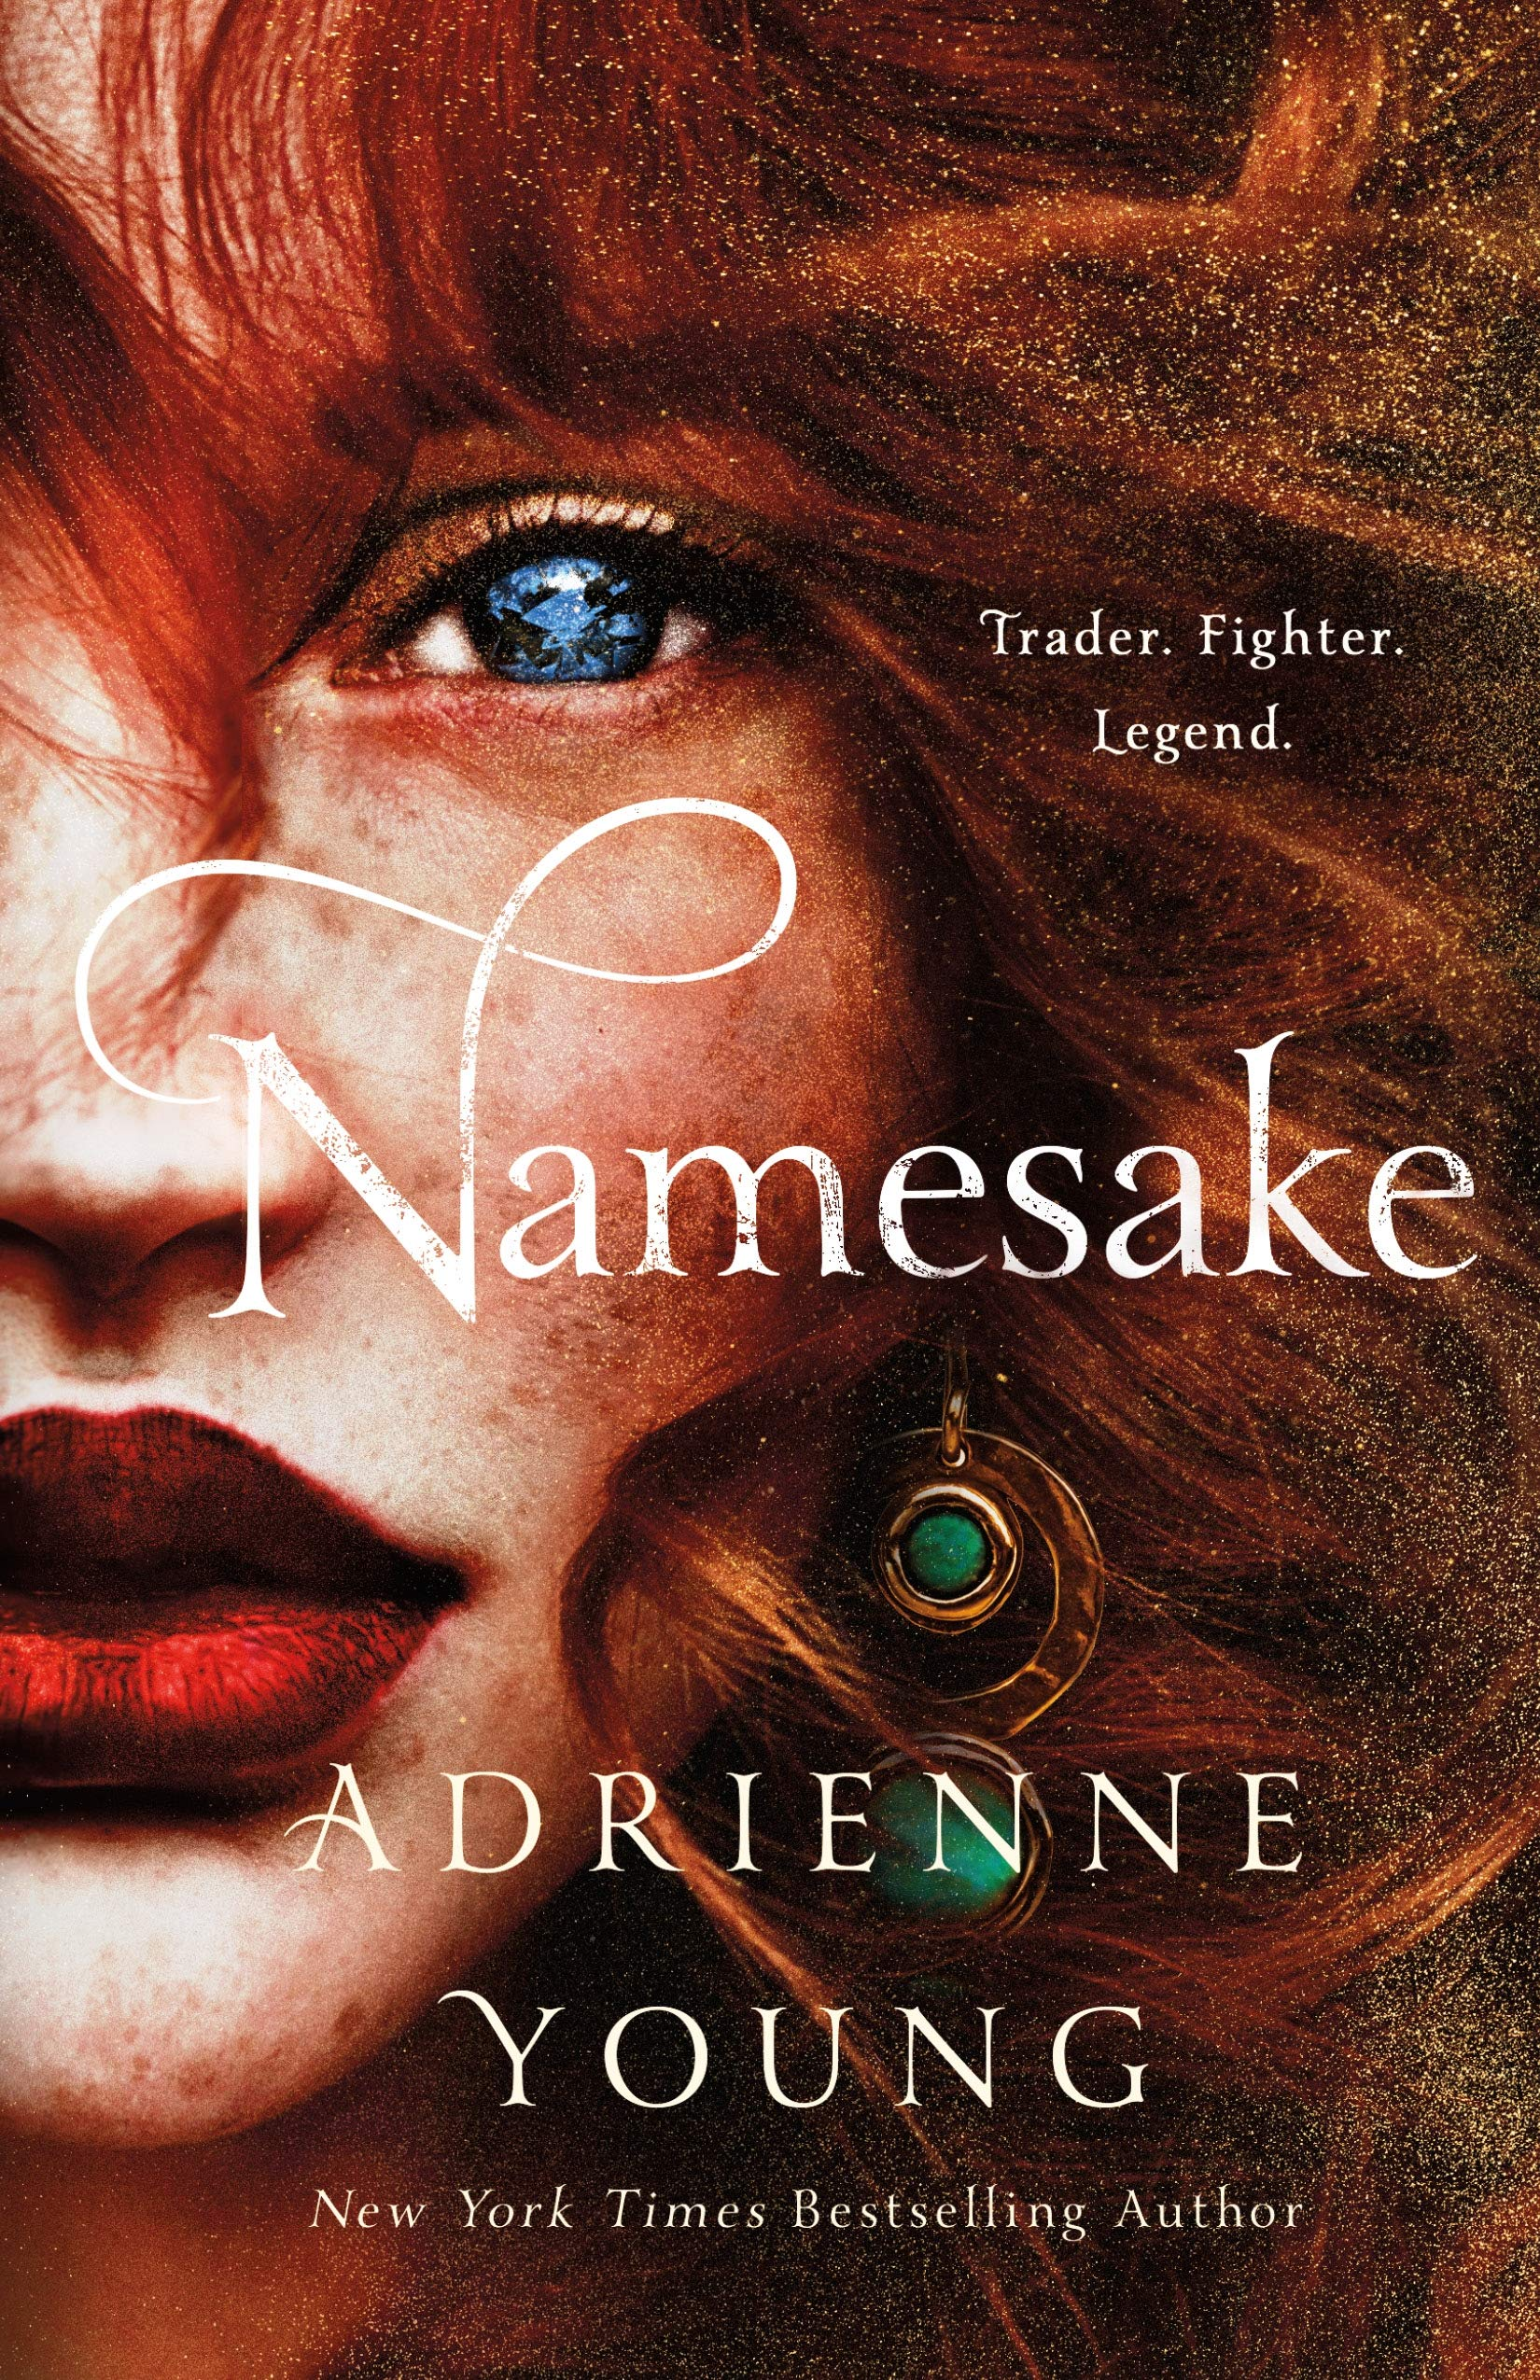 Amazon.com: Namesake: A Novel (Fable, 2) (9781250254399): Young, Adrienne:  Books